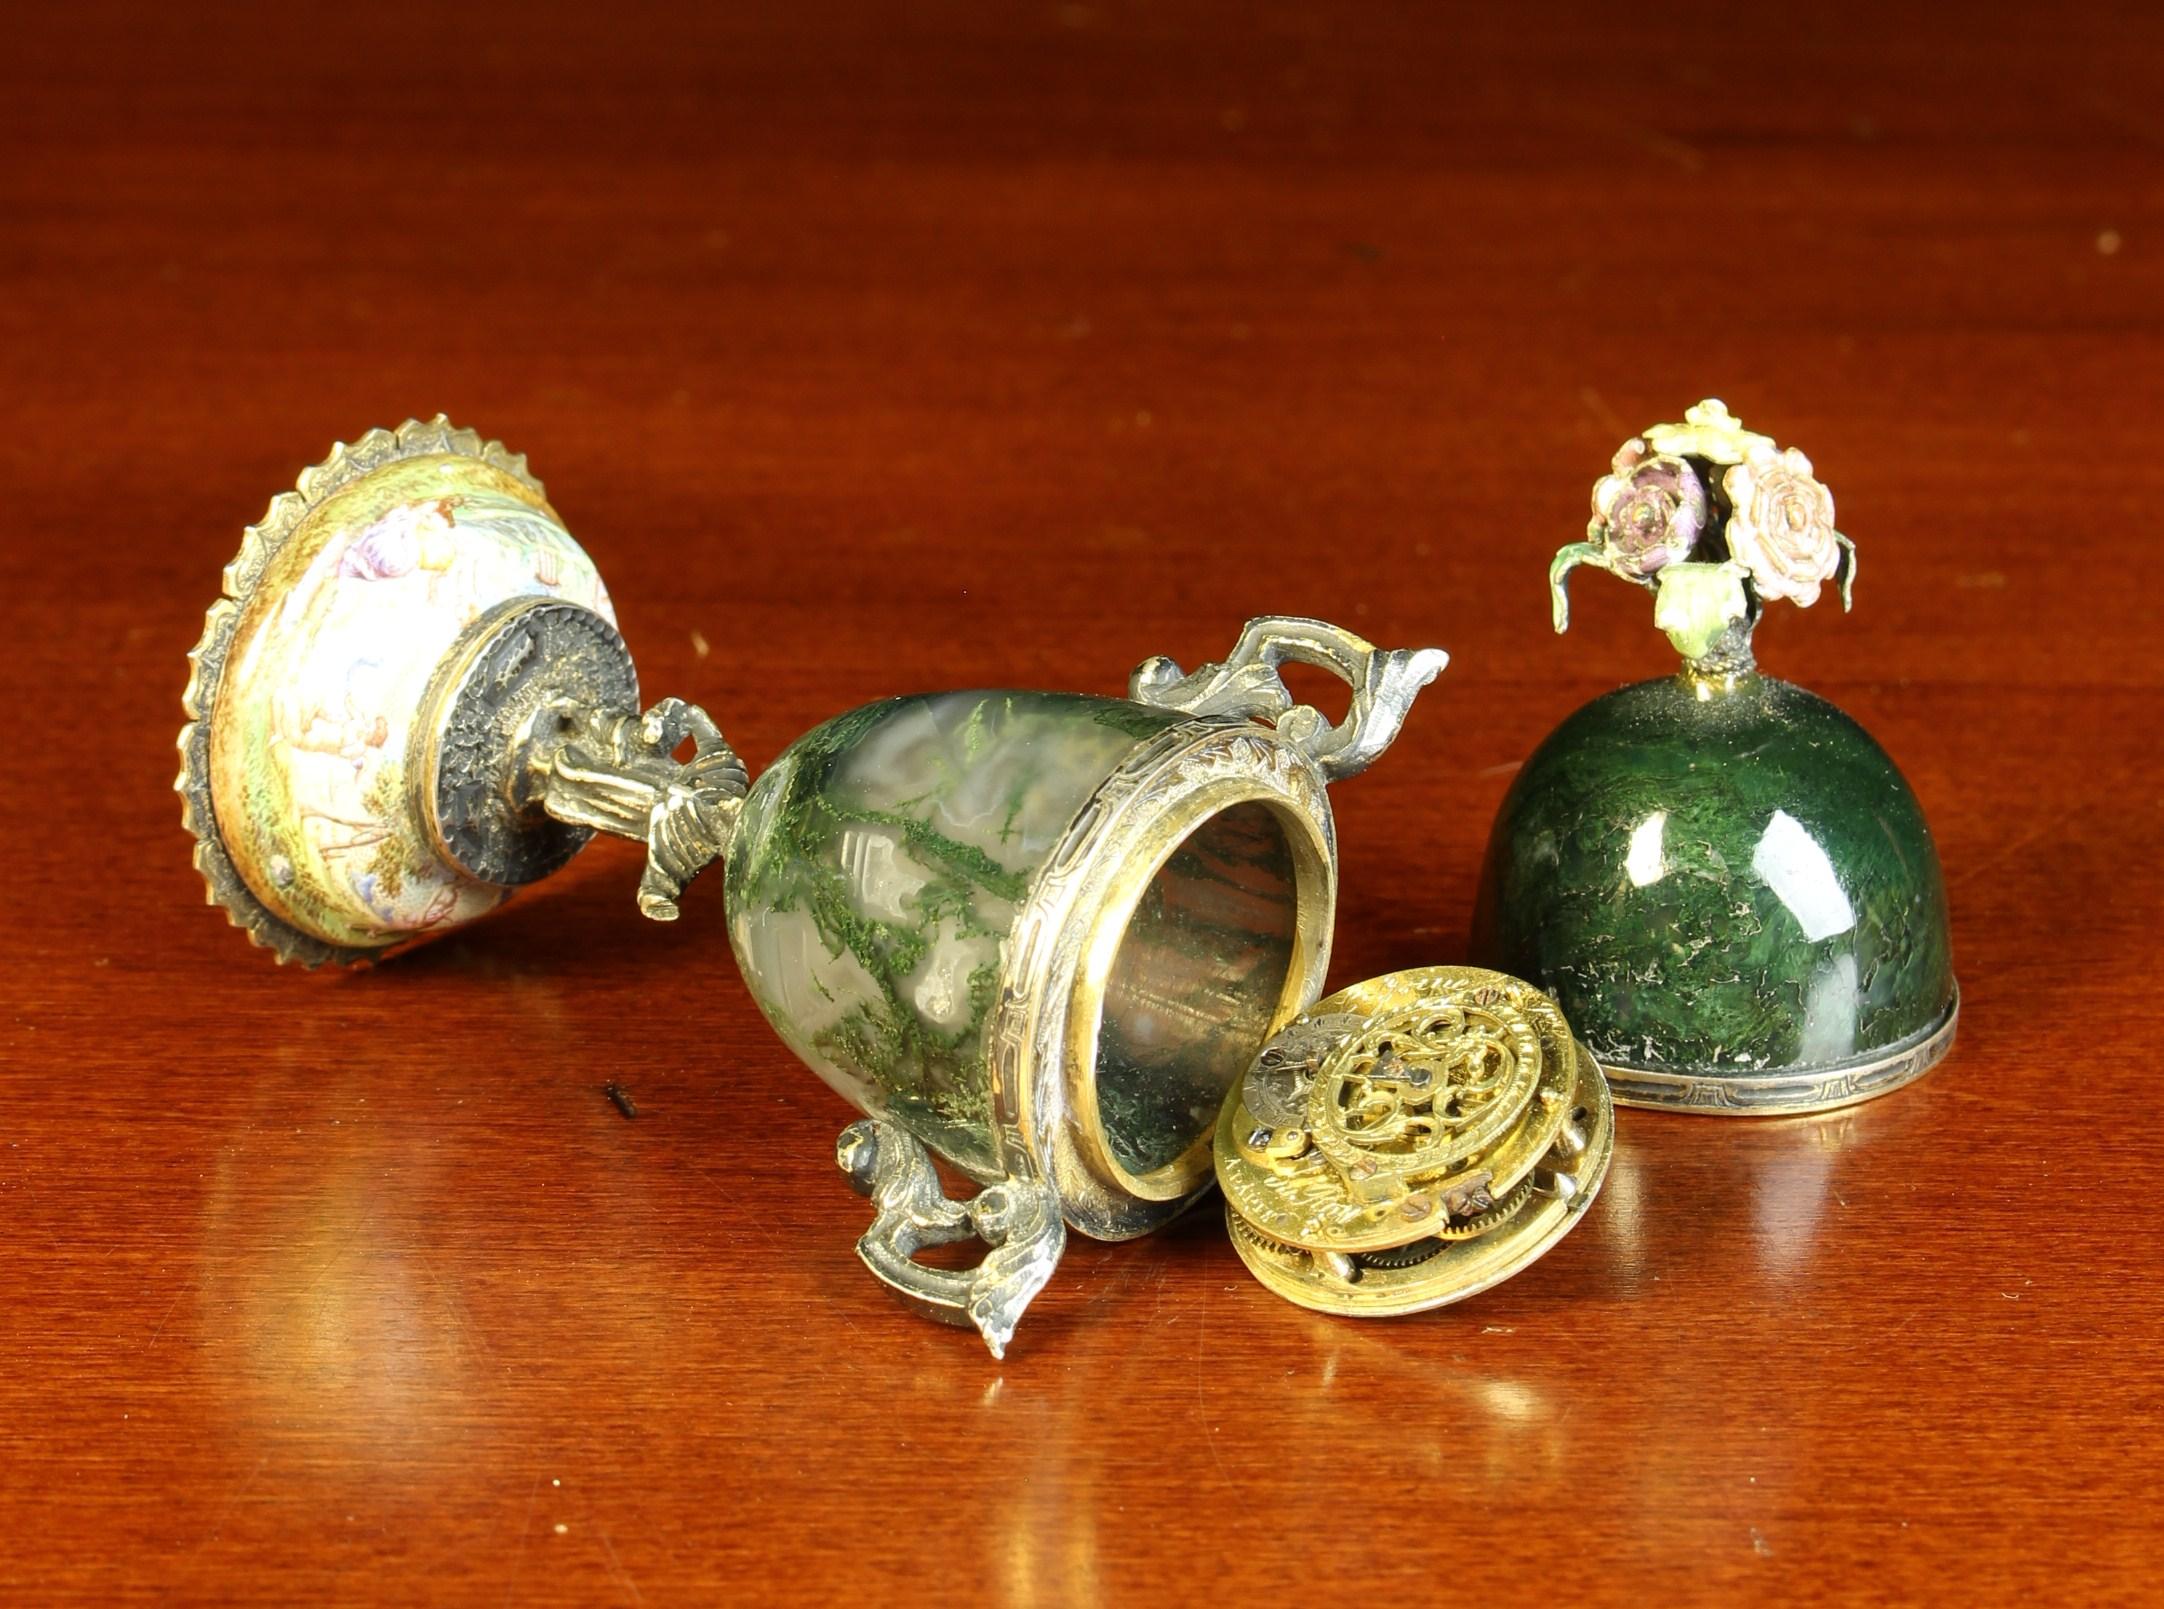 A Bijou Vienna Enamel & Moss-Agate Urn Clock. - Image 2 of 4